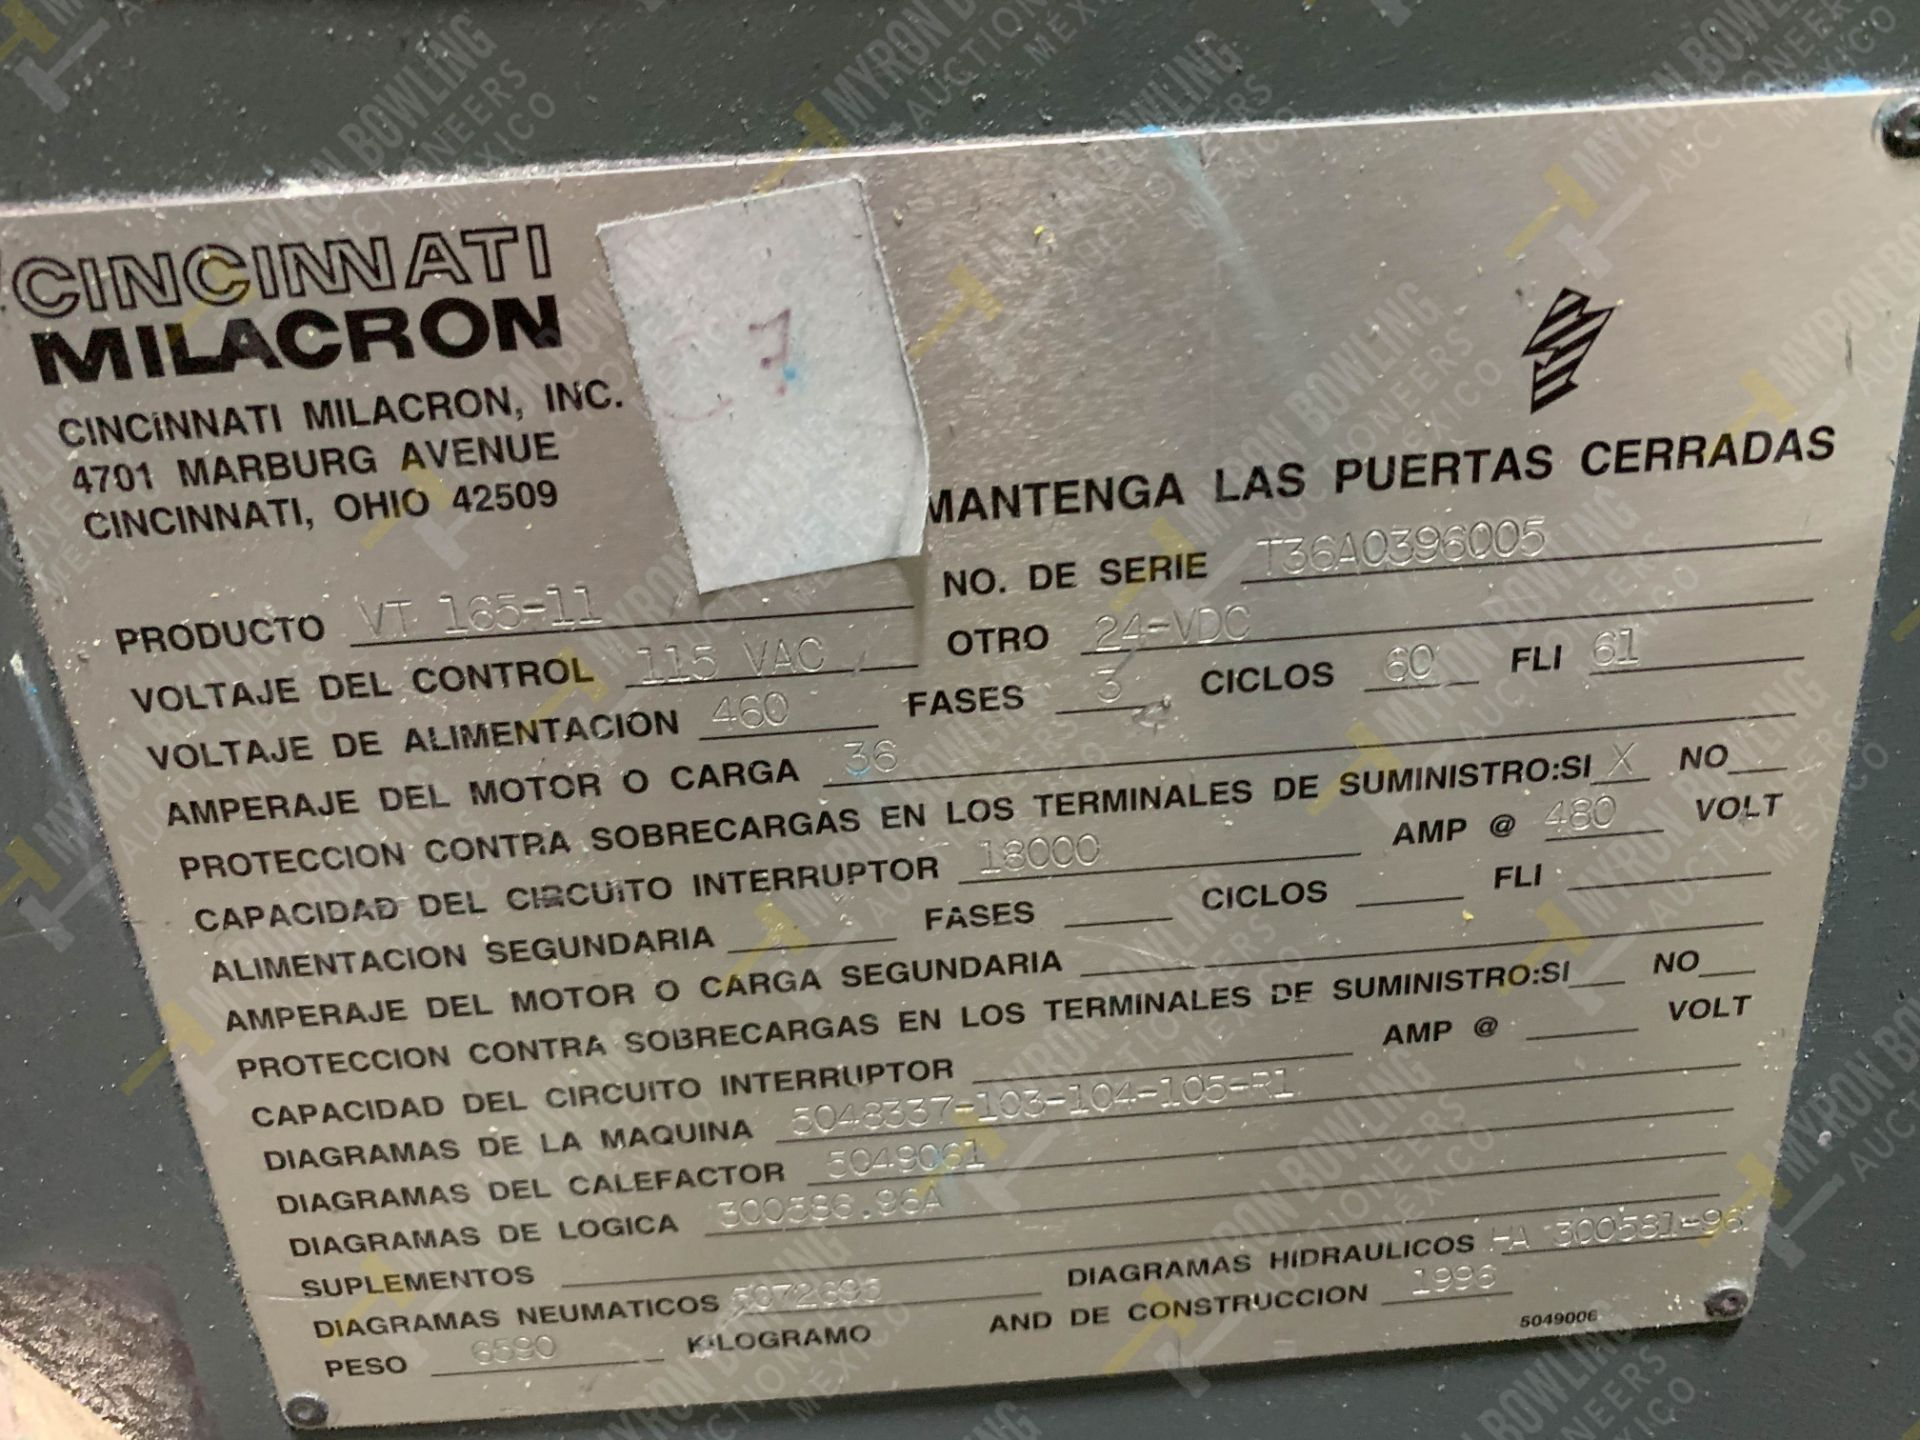 Lot 7 - 165 TON CINCINNATI MILACRON VT165-11 PLASTIC INJECTION MOLDING MACHINE, MFG YEAR 1996